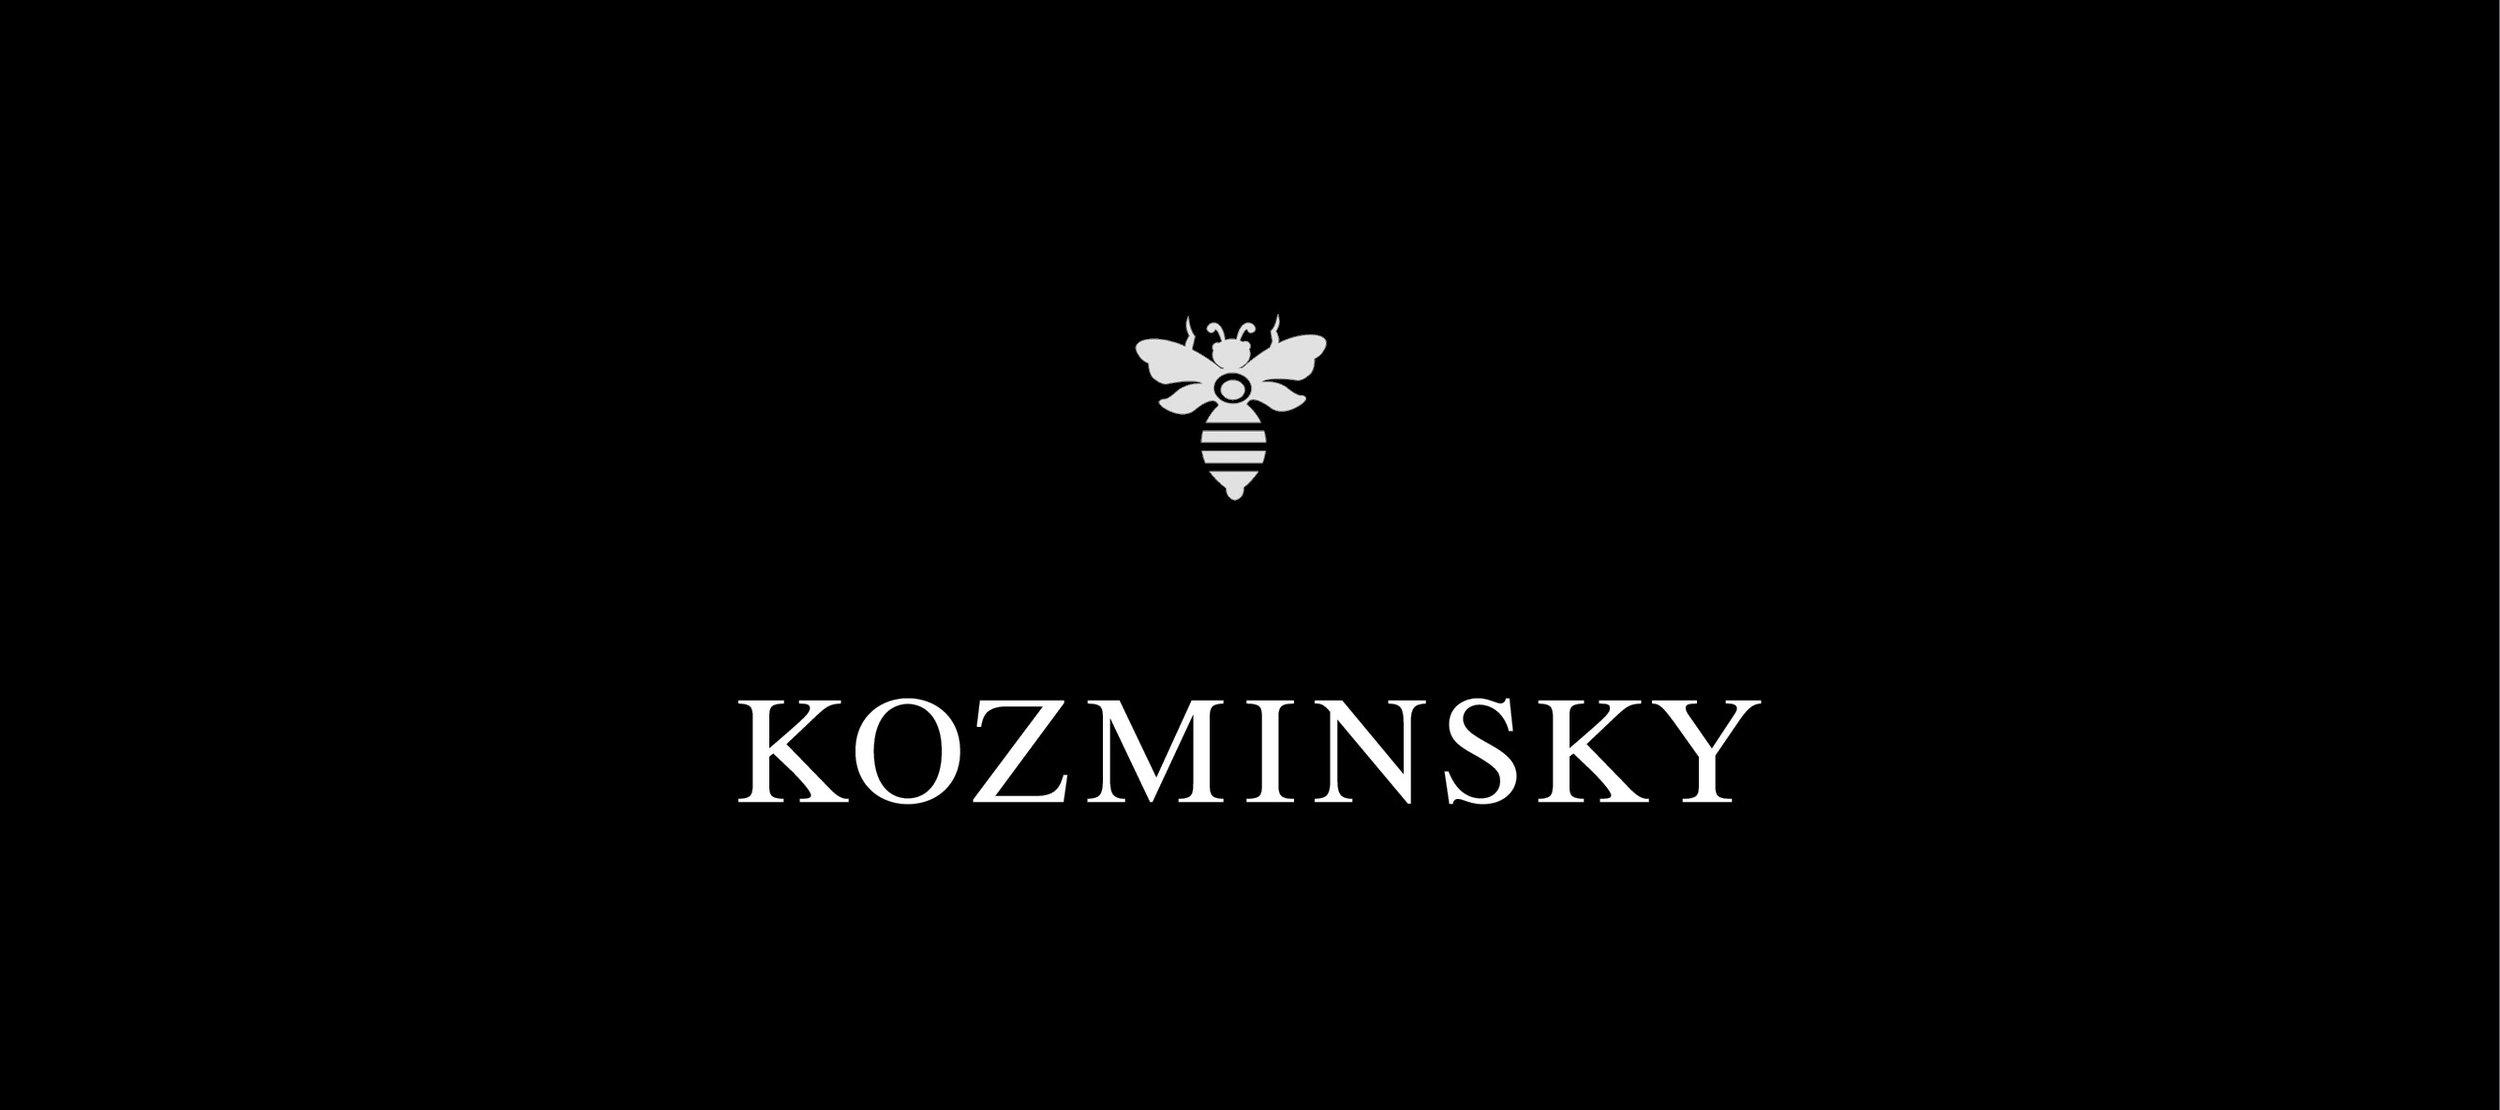 kOZMINSKY logo.jpg